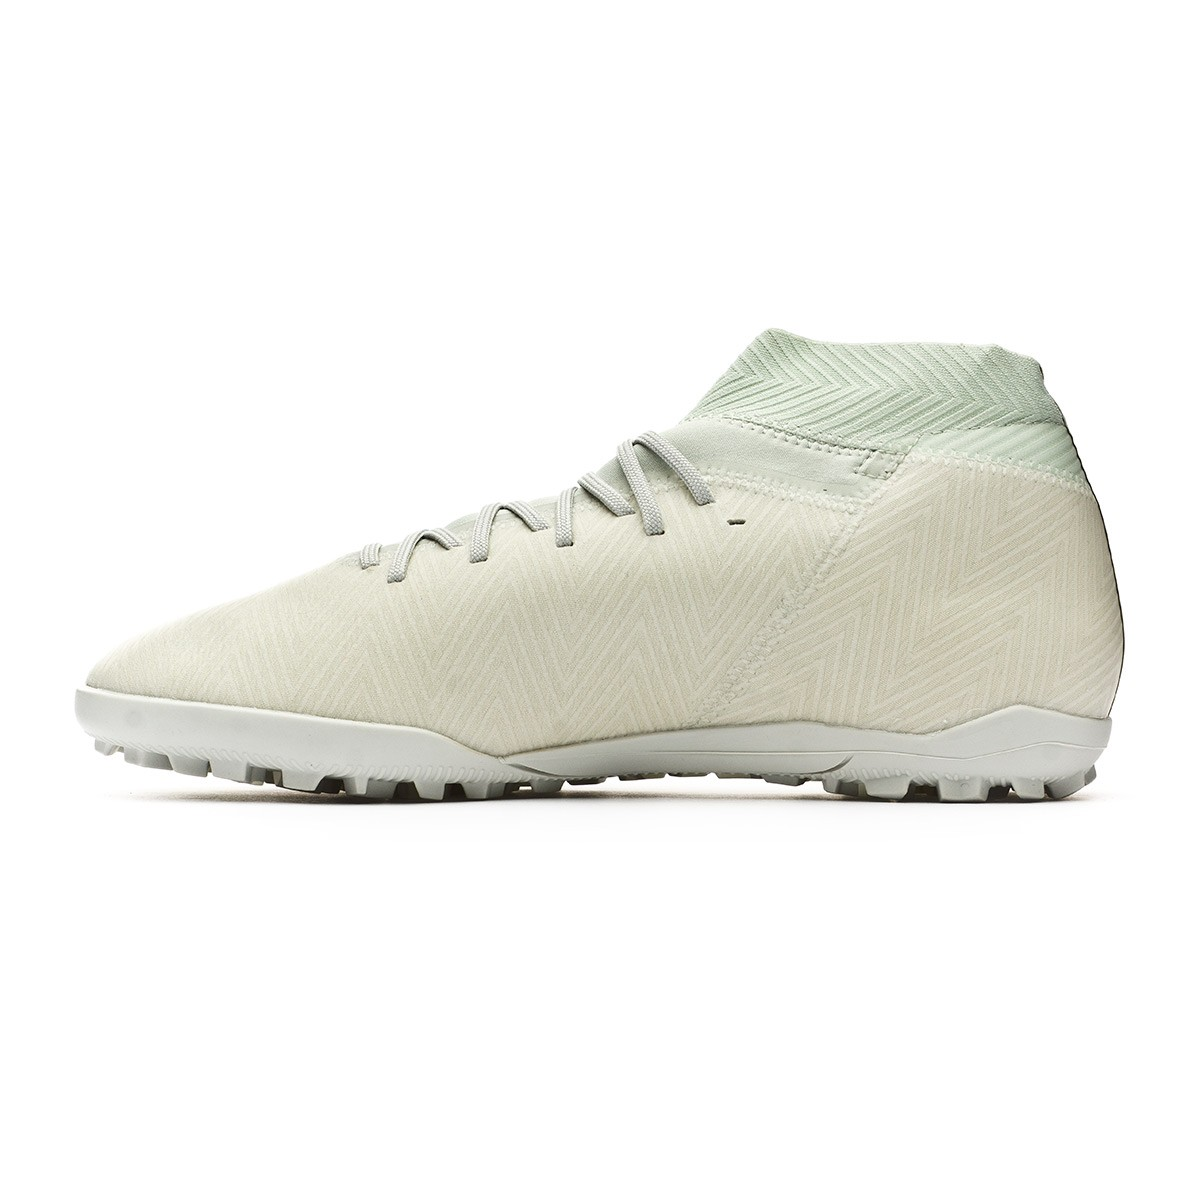 106e1645f28 Football Boot adidas Nemeziz Tango 18.3 Turf Ash silver-White tint - Tienda  de fútbol Fútbol Emotion